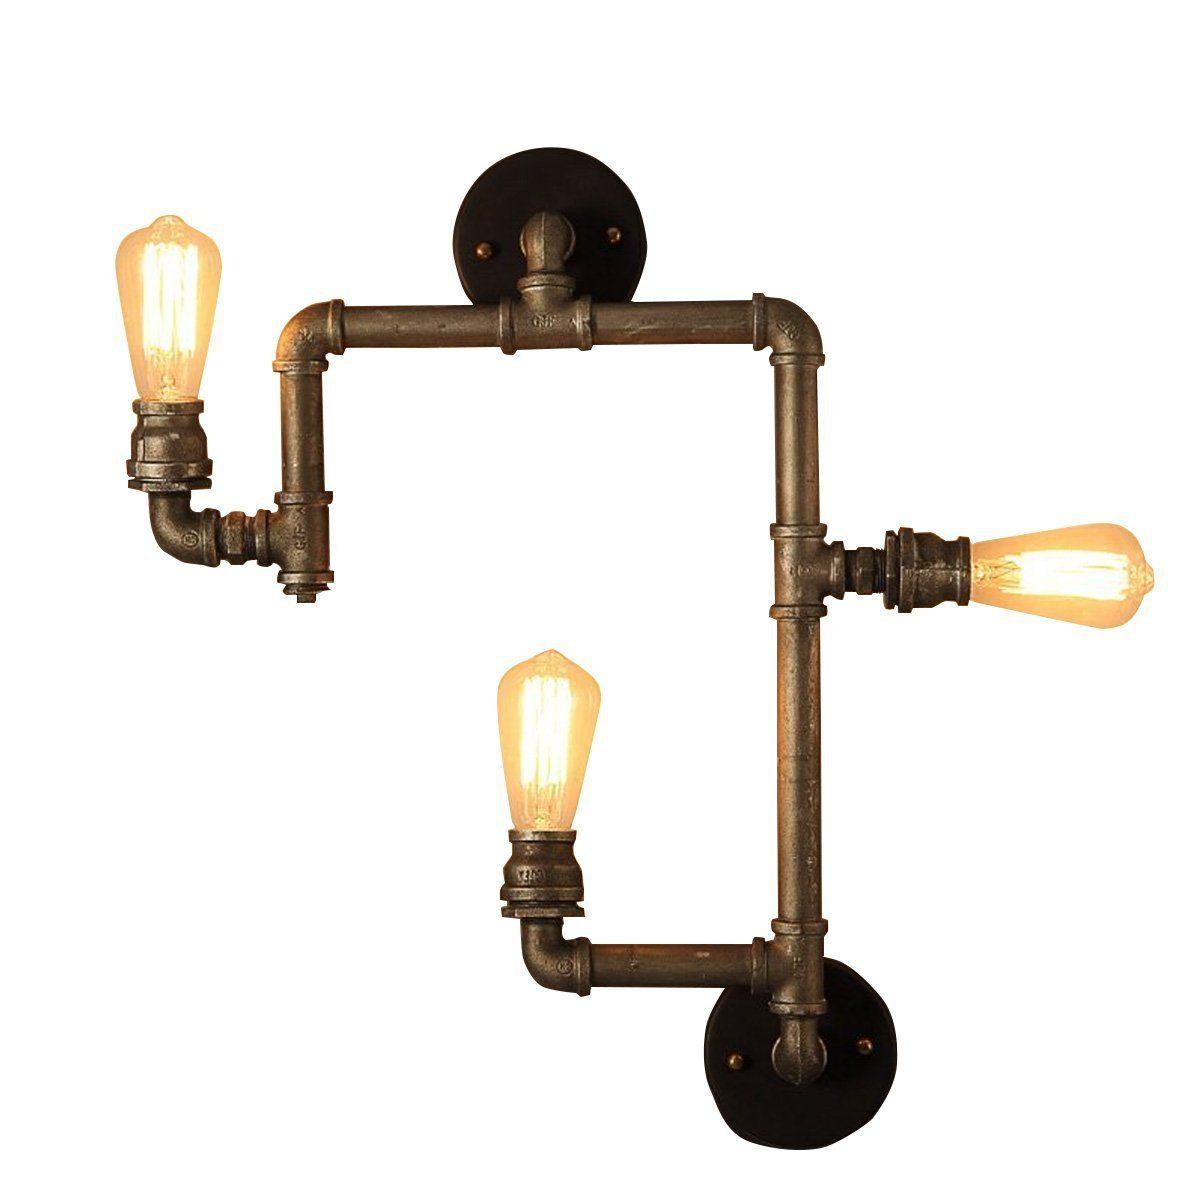 homestia industrial 3 lights retro wasserrohr wandleuchtens wandlampe bronze. Black Bedroom Furniture Sets. Home Design Ideas